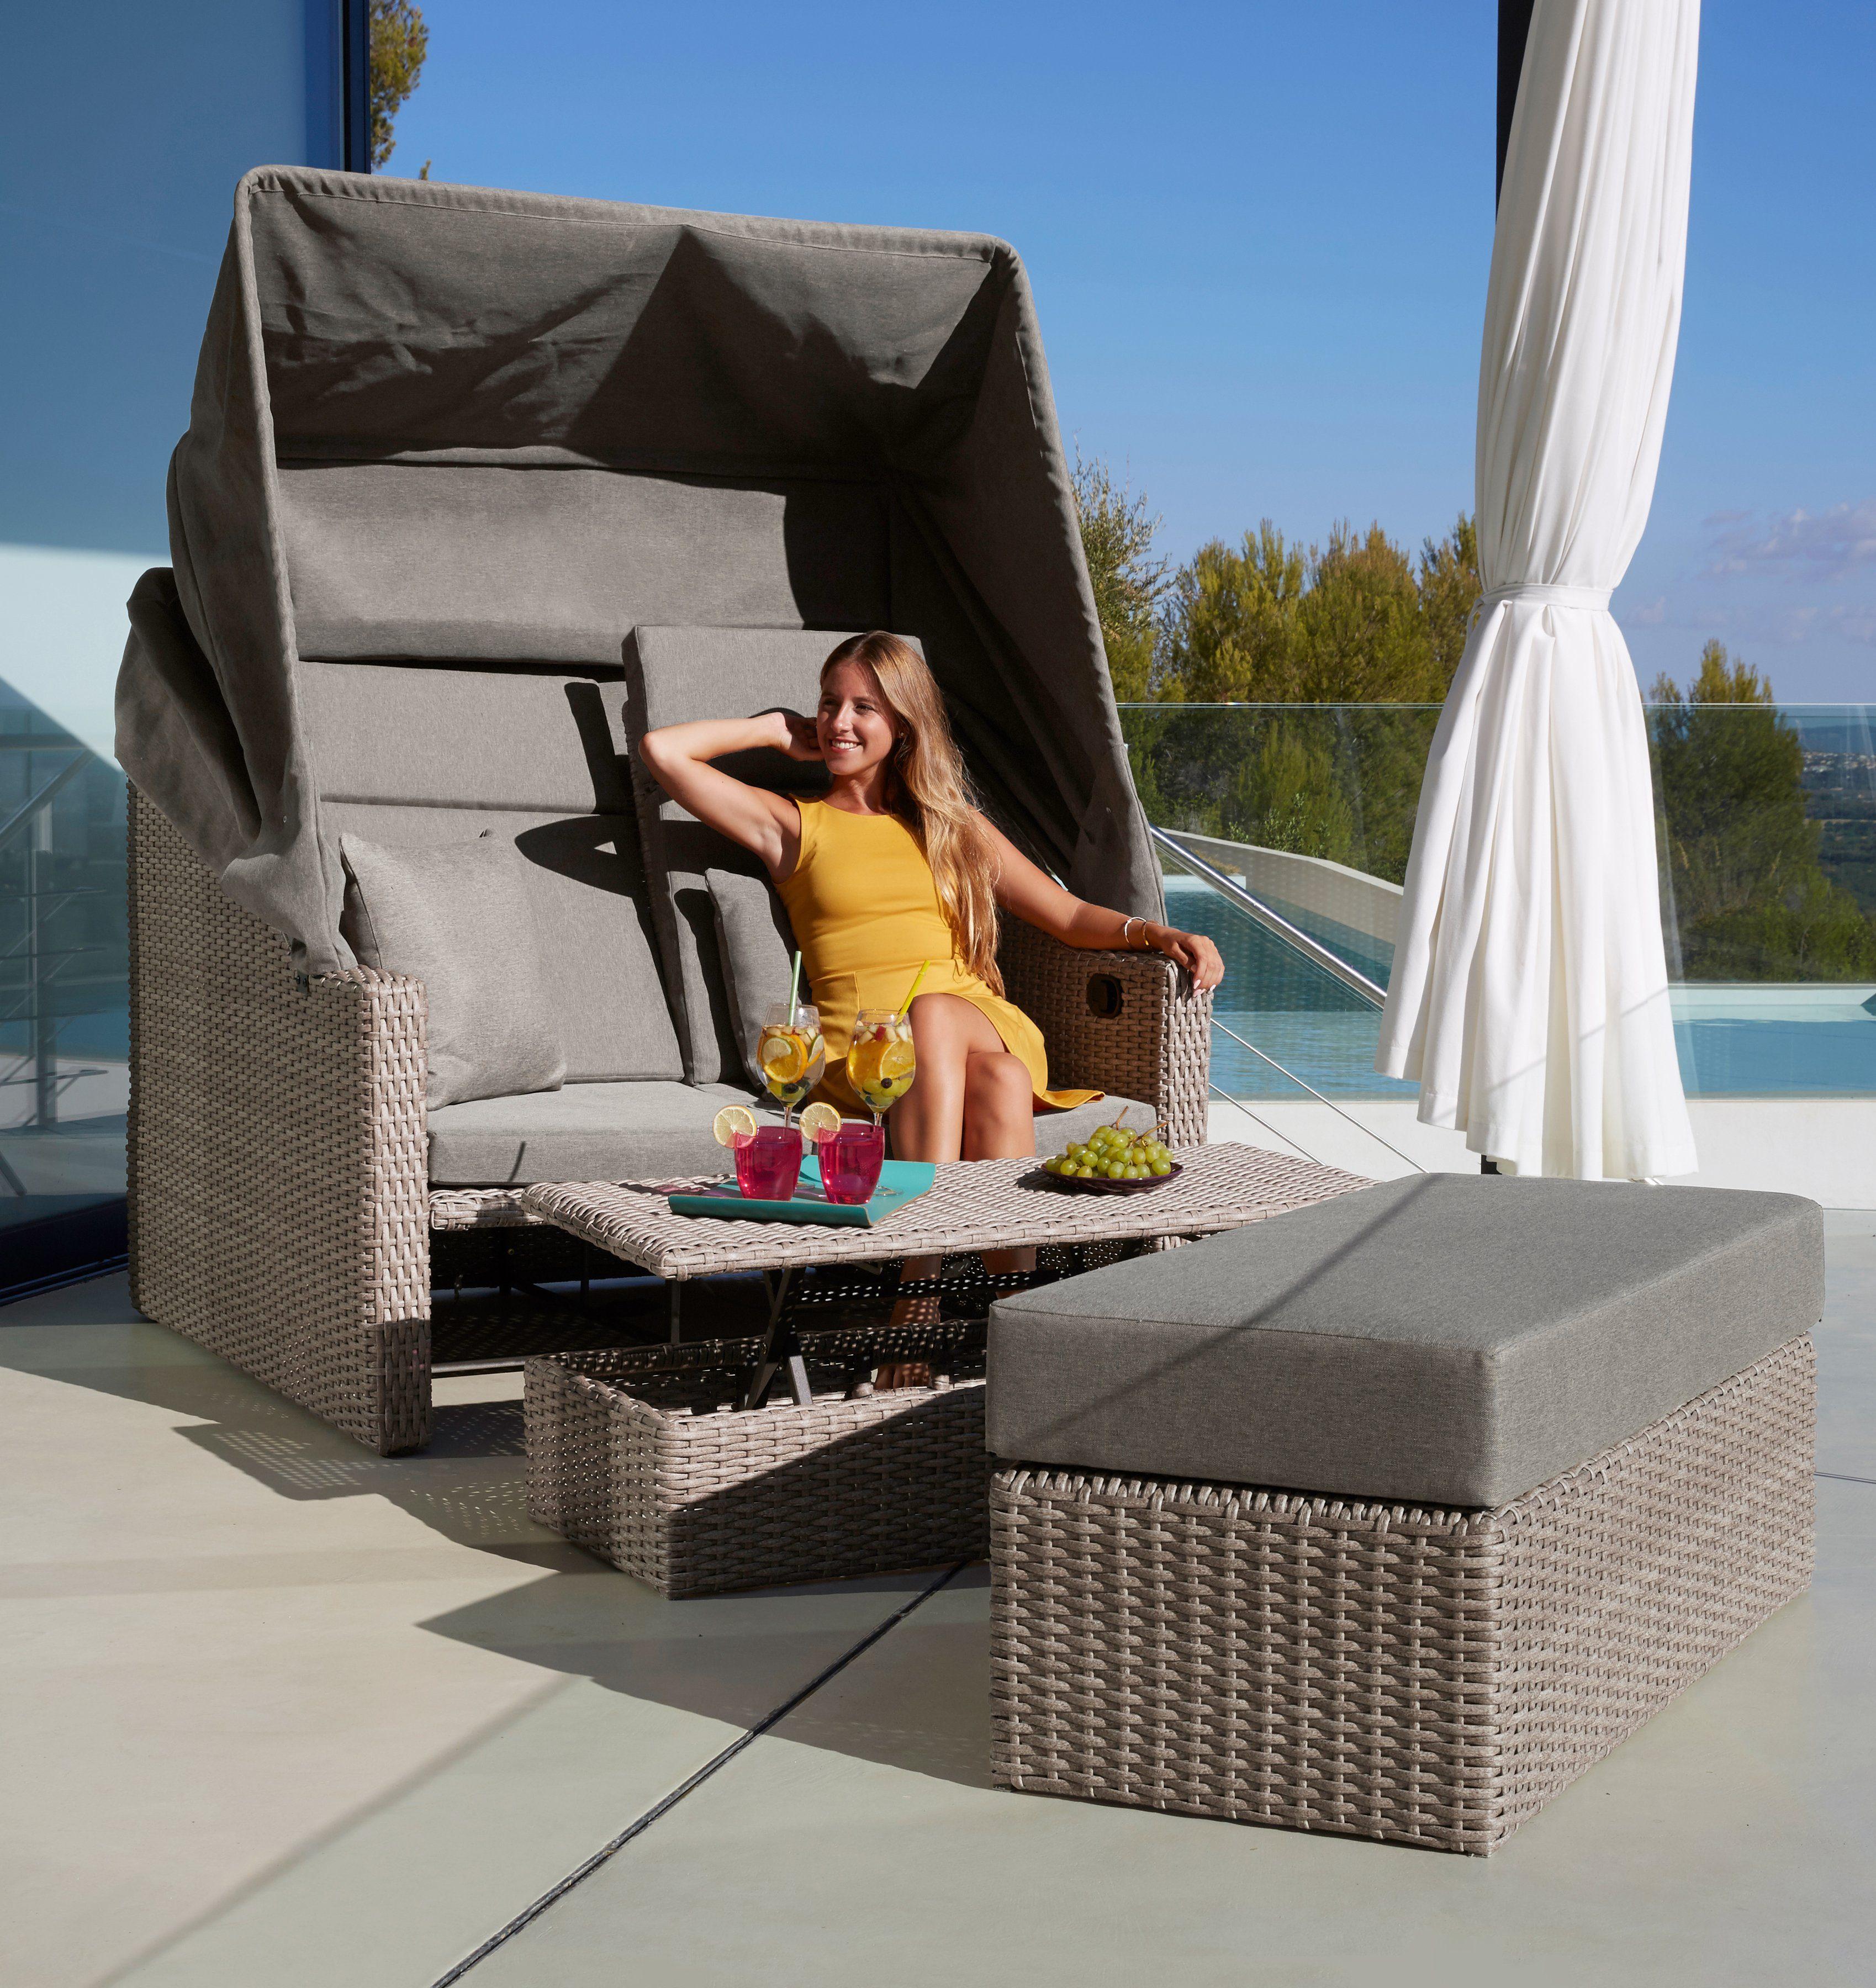 MERXX Loungebett »Rimini«, Polyrattan, braun, inkl. Auflagen